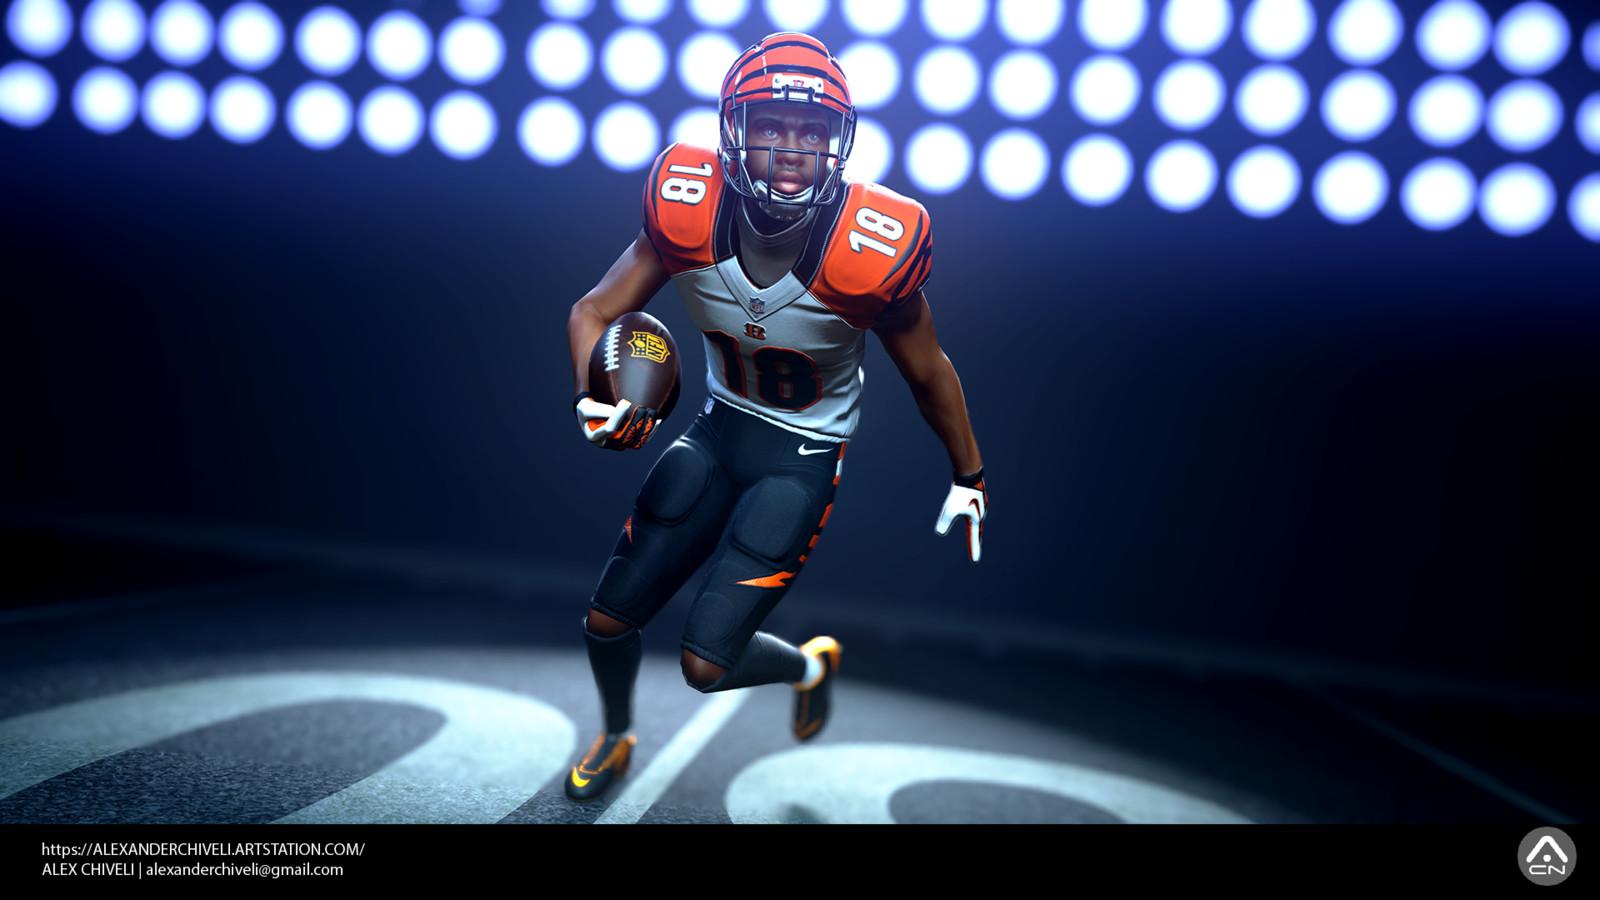 NFL Player Marmoset Beauty